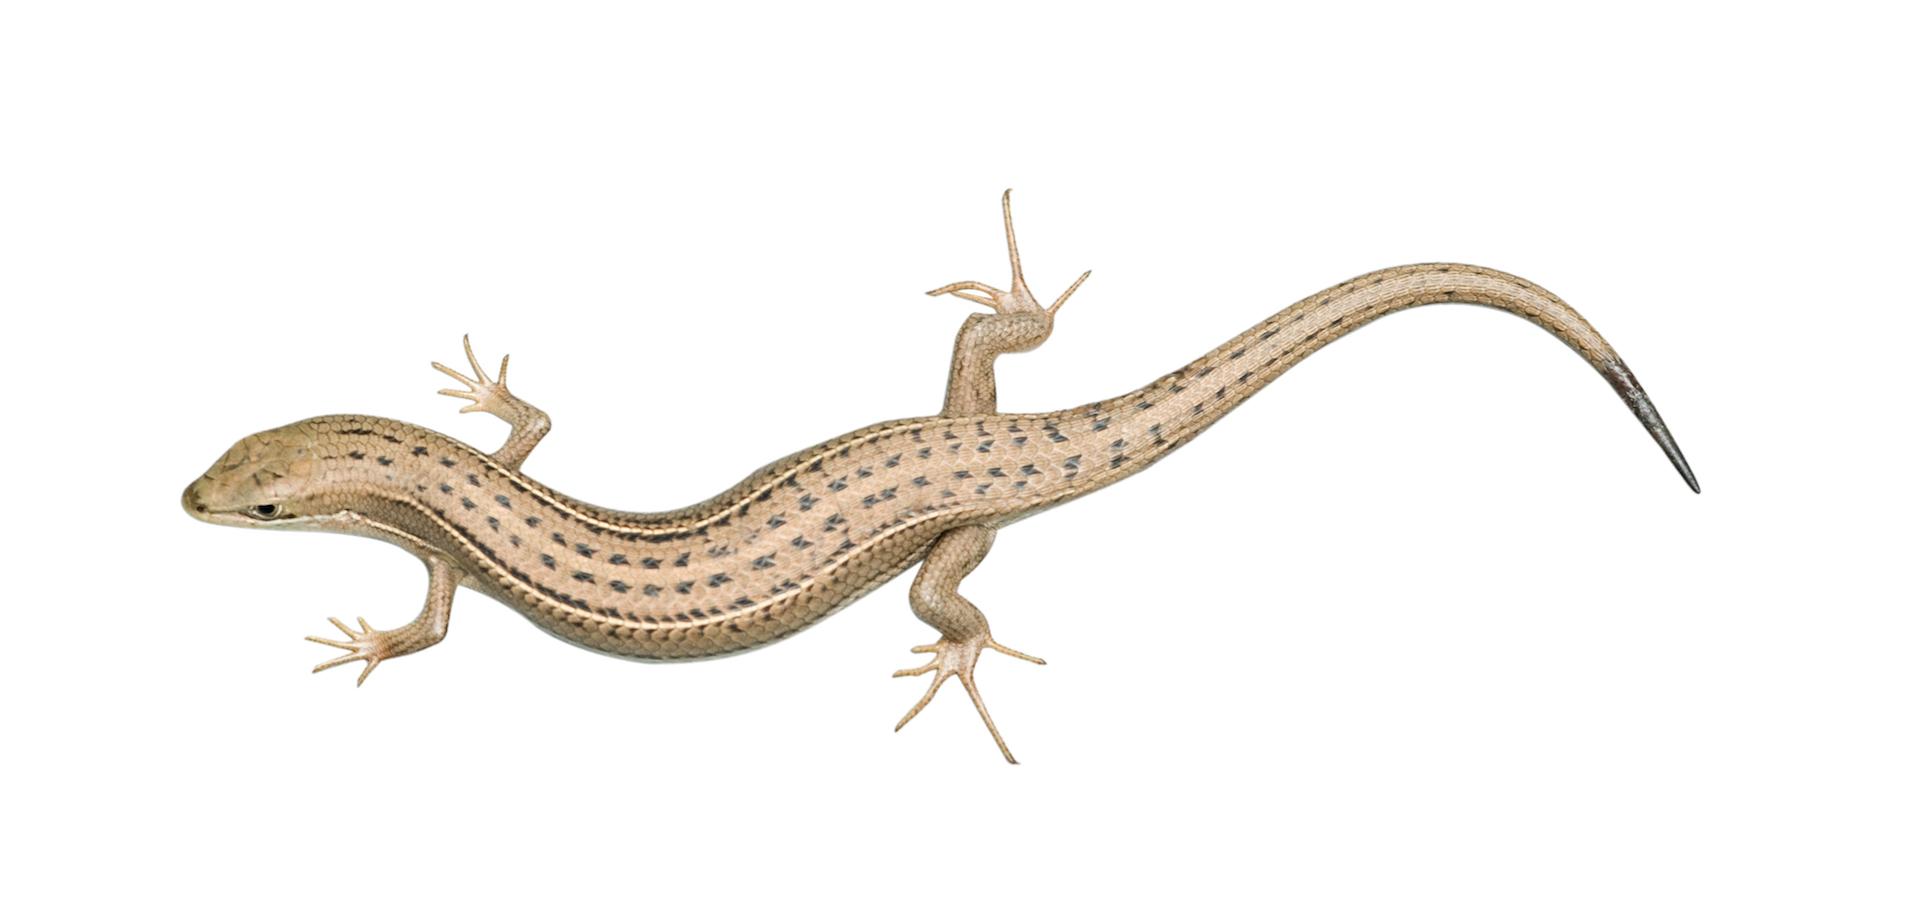 Skink lizard isolated on white background